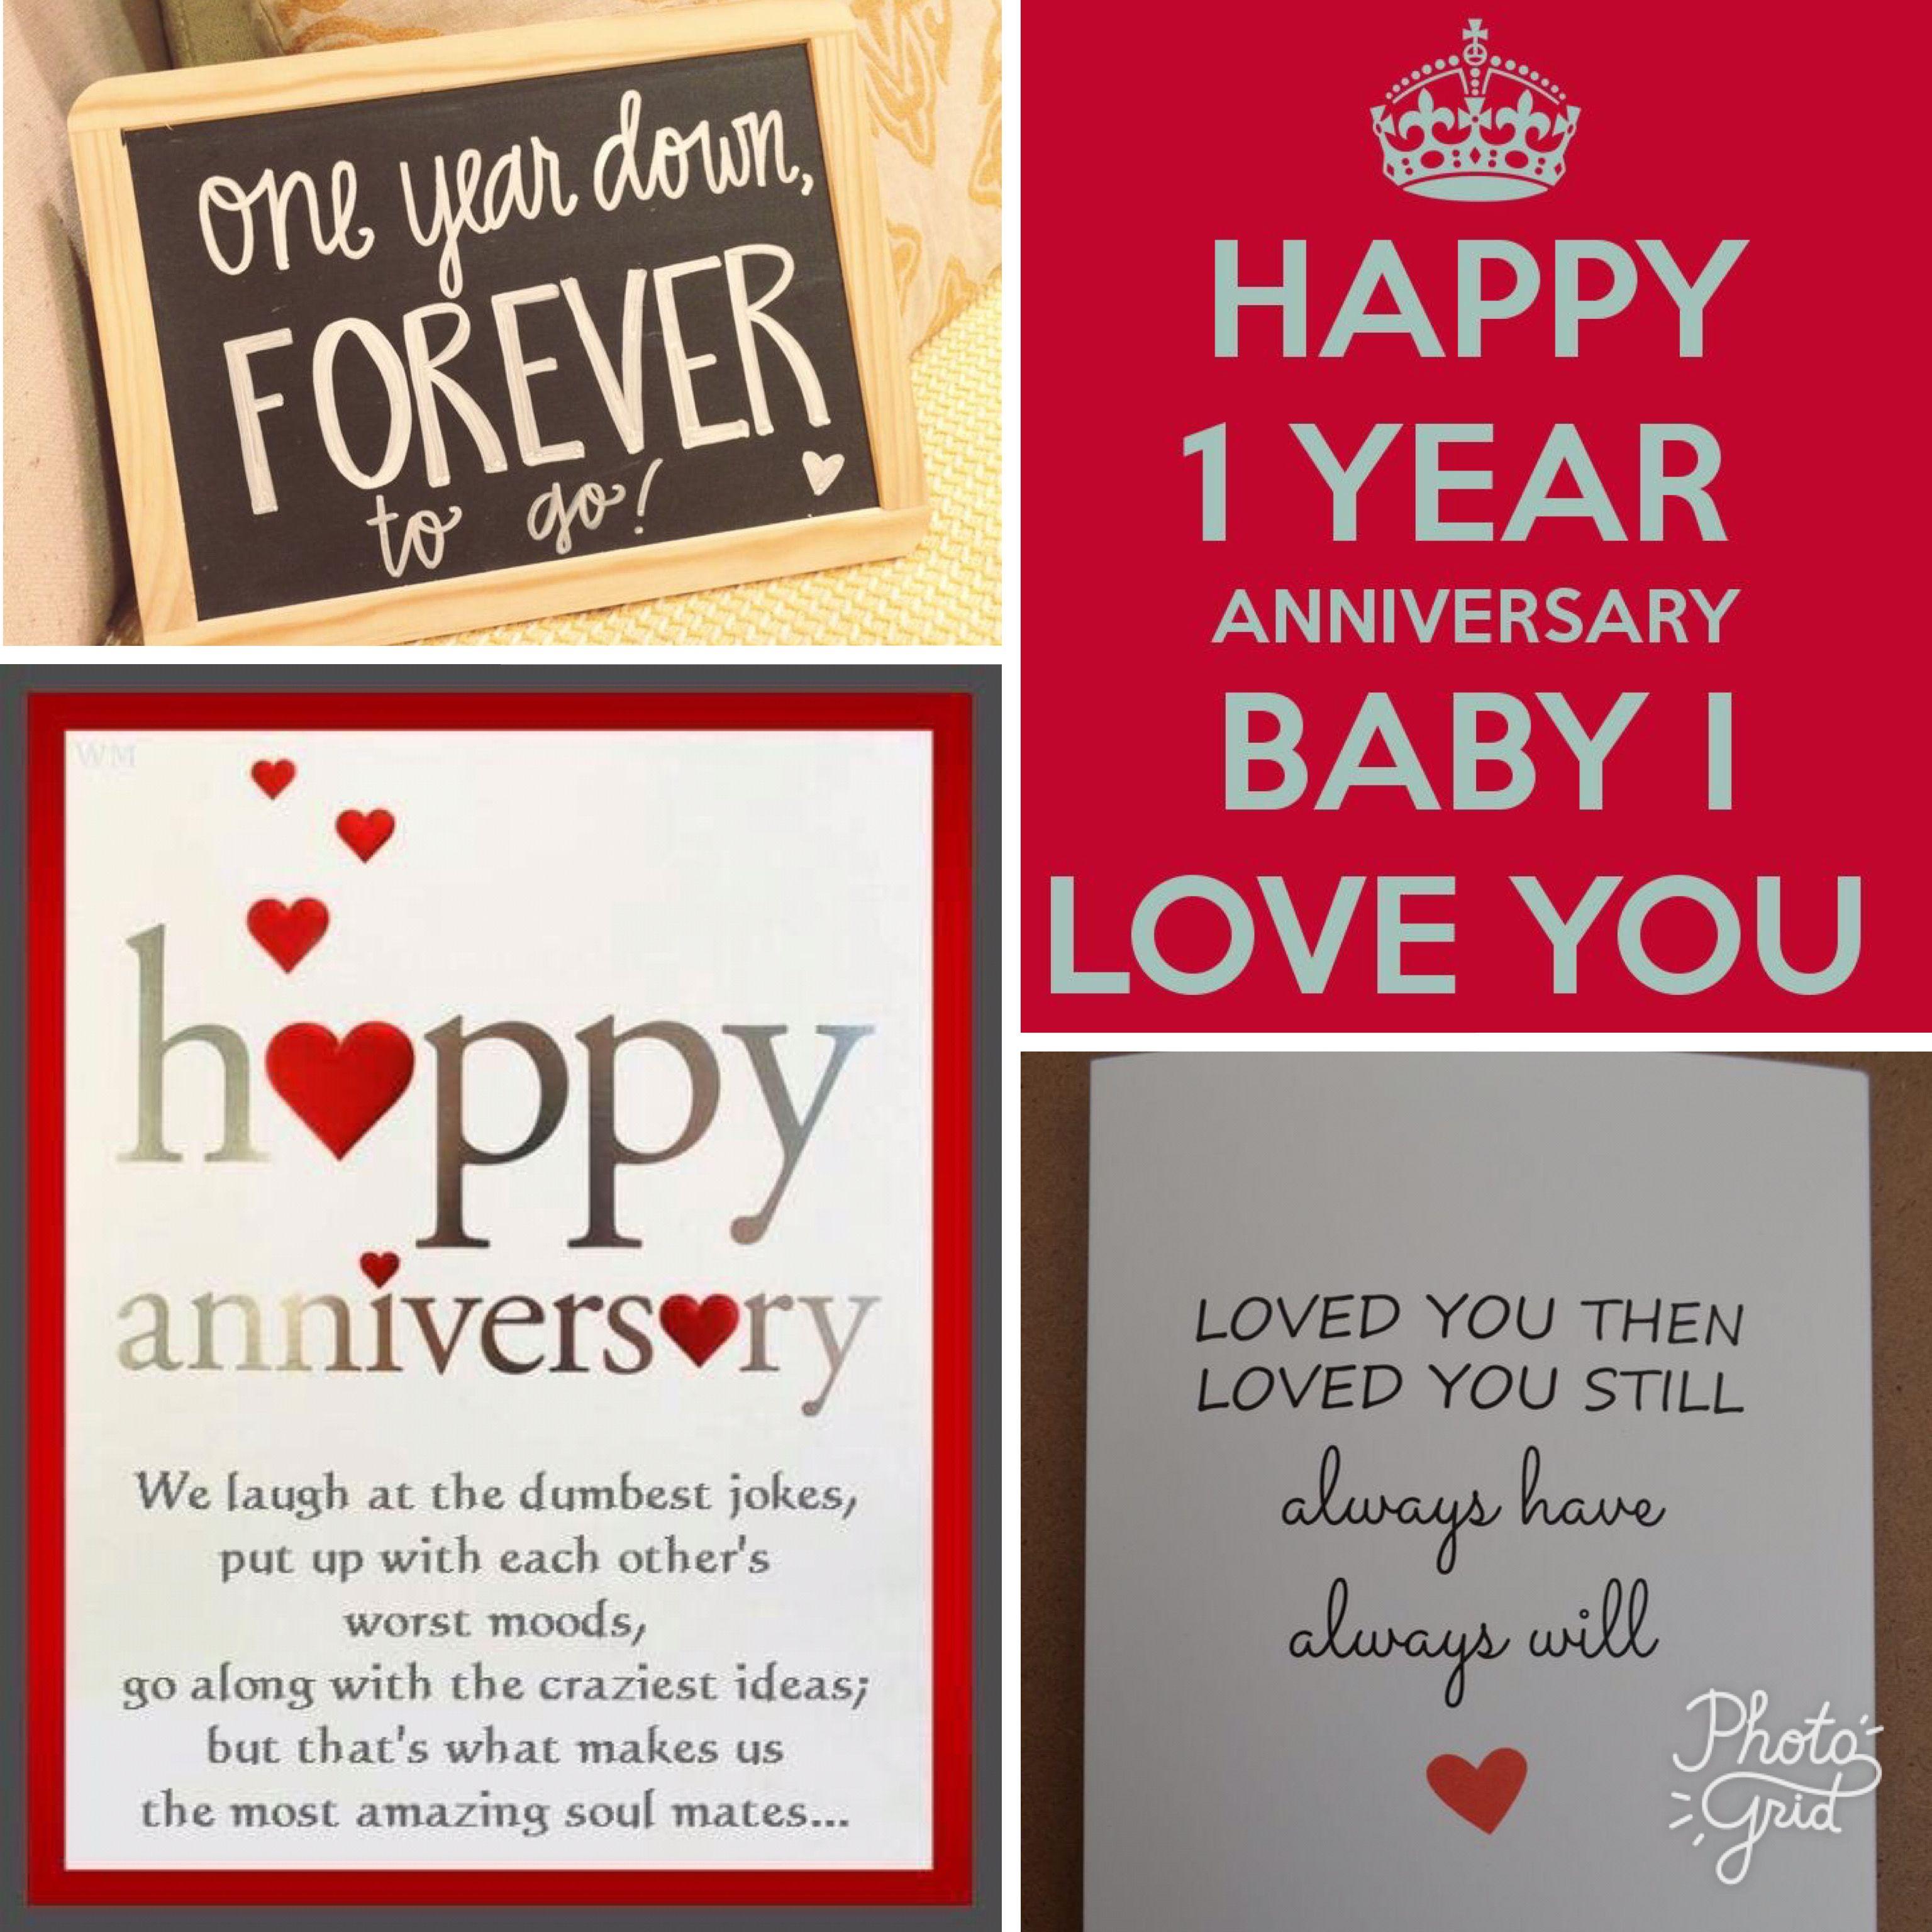 1 Year Relationship Anniversary Wishes For Boyfriend